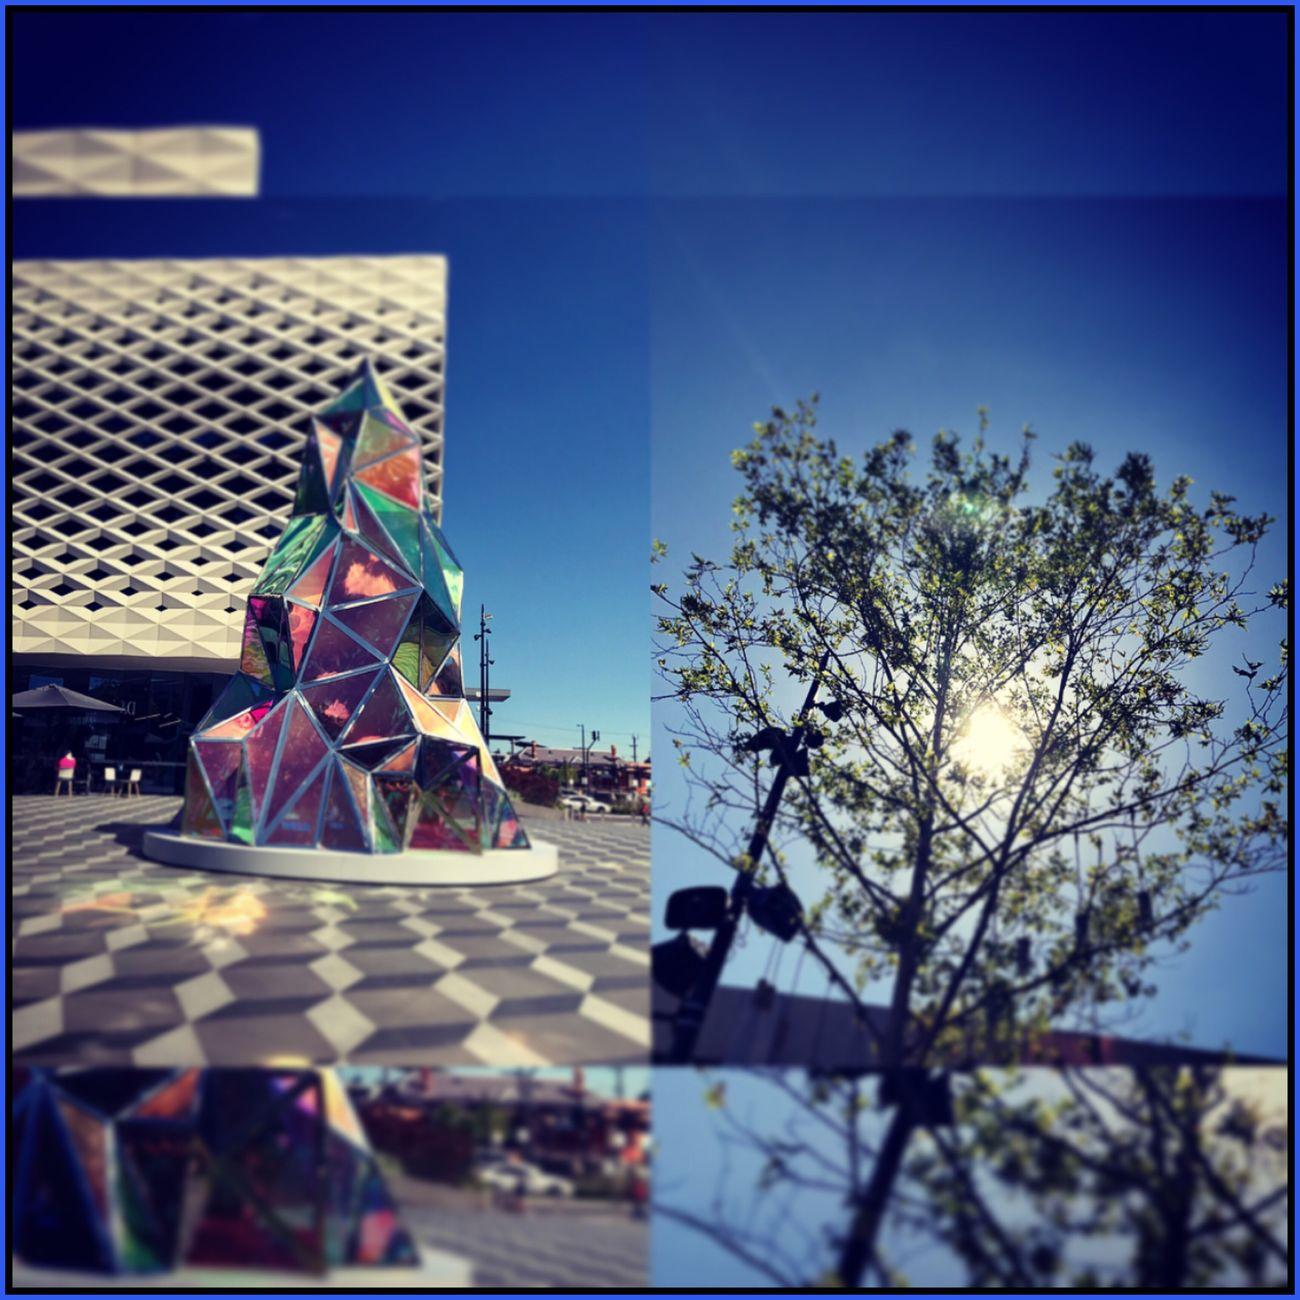 Interesting thing's at Eastland 🎄☀️🍃🏢 MyPhotography ChristmasTreeArt ChristmasTreeStatue ModernChristmas Plaza Summer Sunshine Tree Throughmyeyes Interesting Building Eyeemcollection 🏢🎄☀️🍃